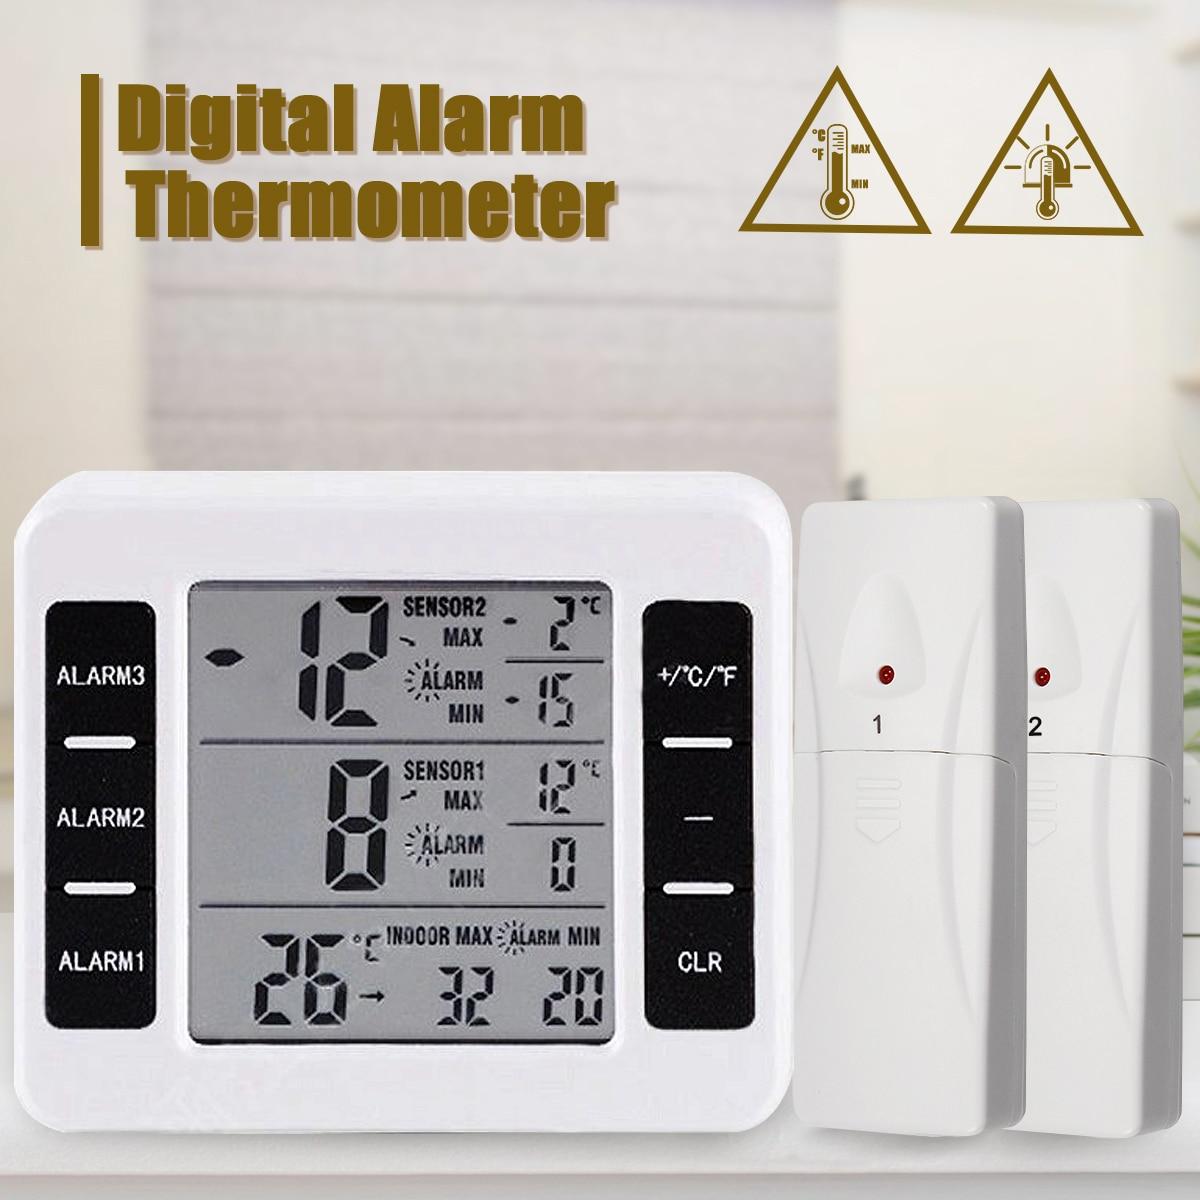 Wireless Digital Freezer Thermometer Indoor Outdoor Audible Alarm With Sensor temperature  Reminding deviceWireless Digital Freezer Thermometer Indoor Outdoor Audible Alarm With Sensor temperature  Reminding device